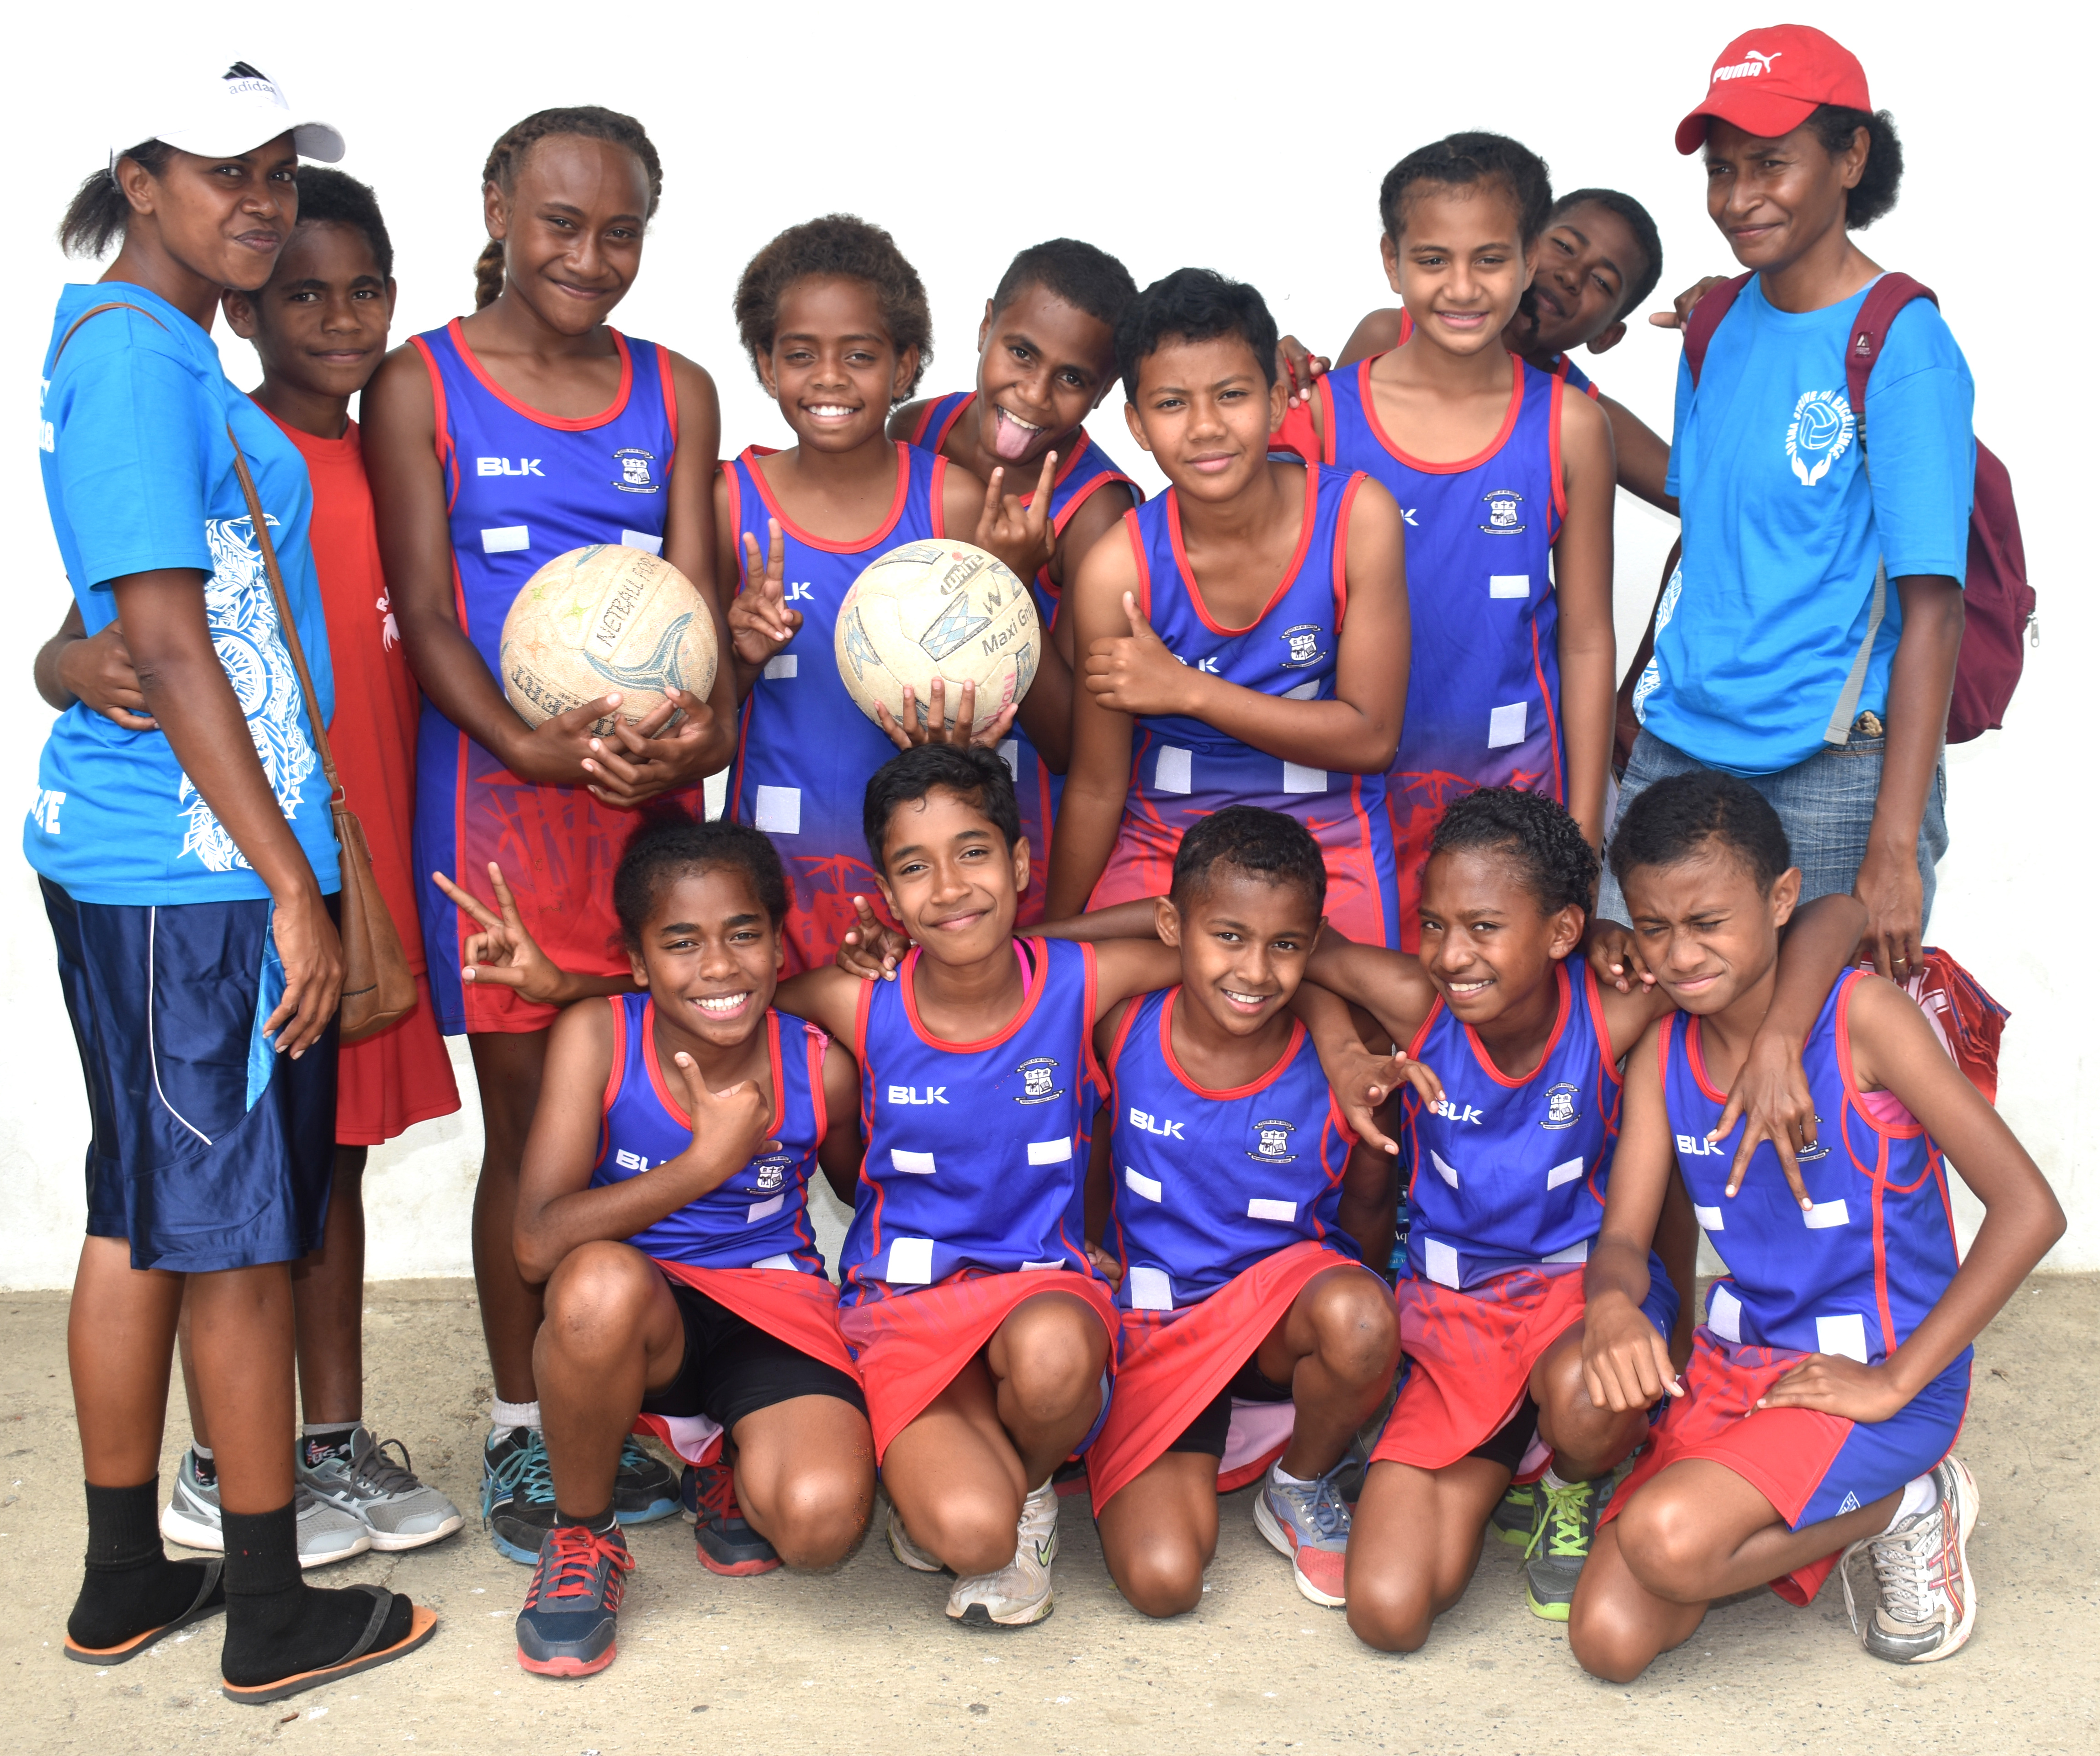 Ra Under-9 team at Lawaqa Park, Sigatoka on August 16,2018.  Photo: Arieta Vakasukawaqa